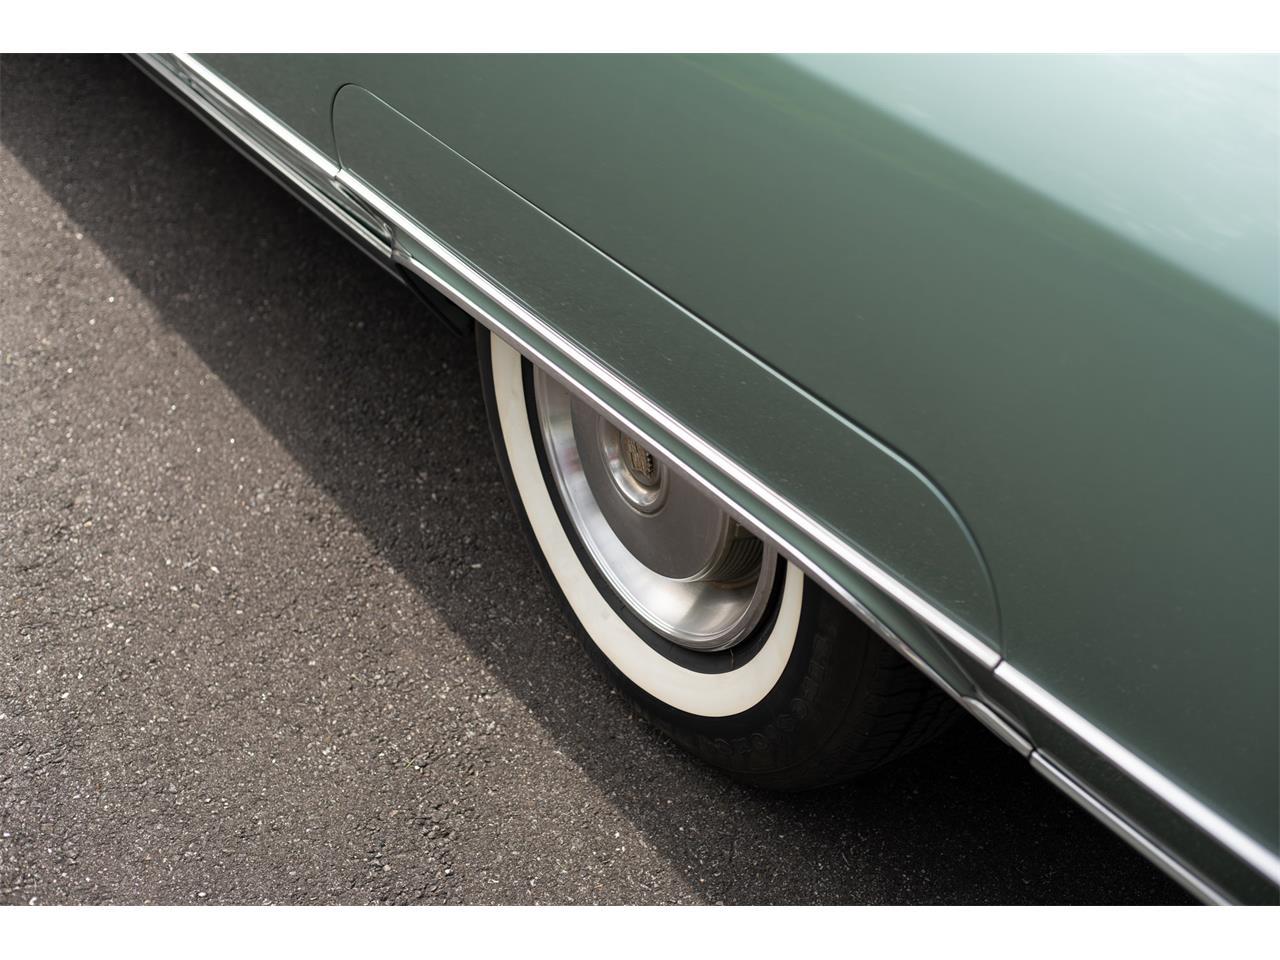 1966 Cadillac Eldorado (CC-1224187) for sale in Orange, Connecticut